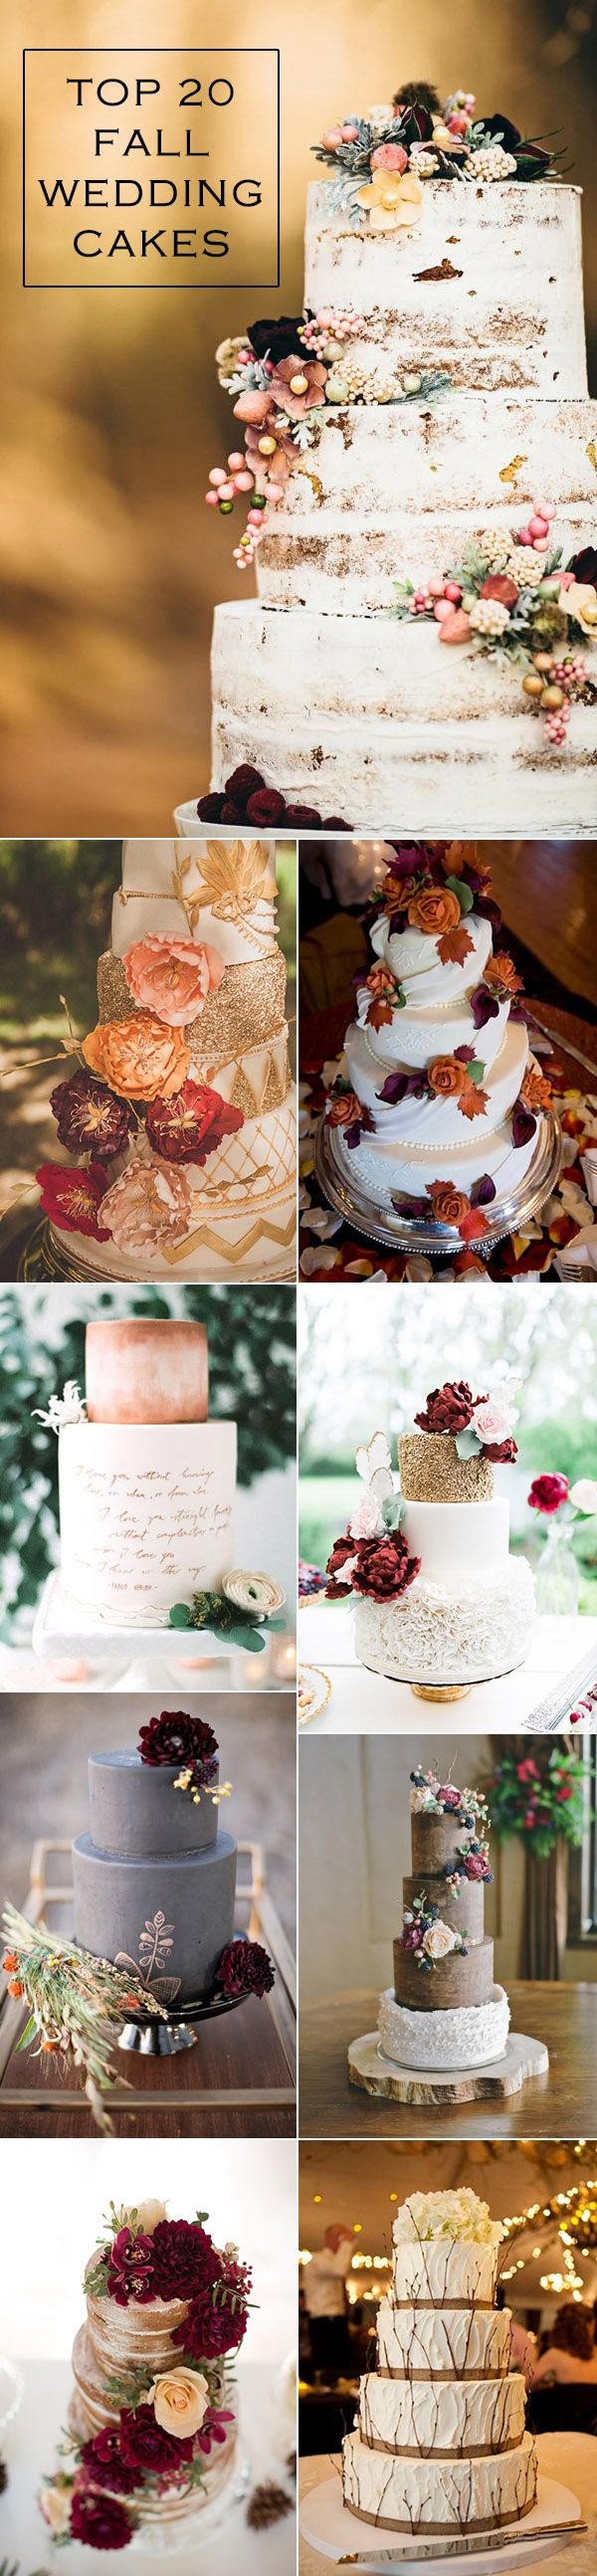 2016 trending top fall wedding cakes for autumn wedding ideas                                                                                                                                                                                 More